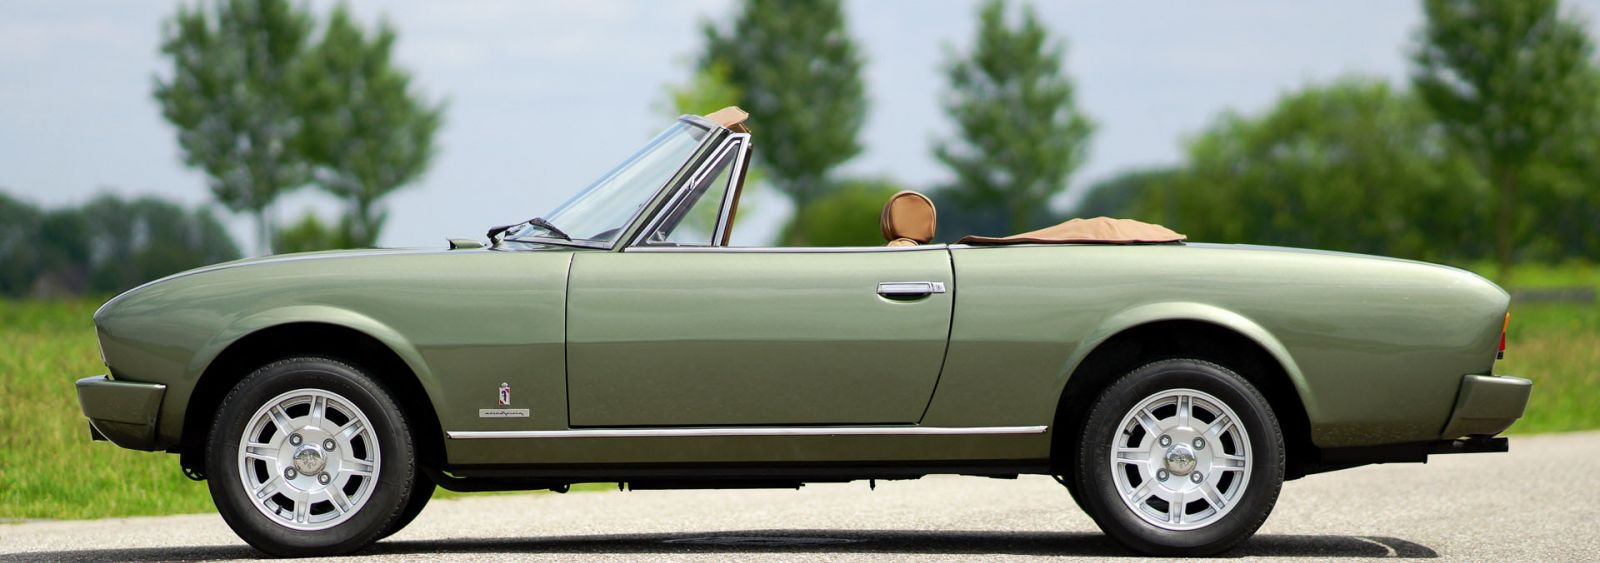 peugeot 504 pininfarina cabriolet 1979 classicargarage fr. Black Bedroom Furniture Sets. Home Design Ideas